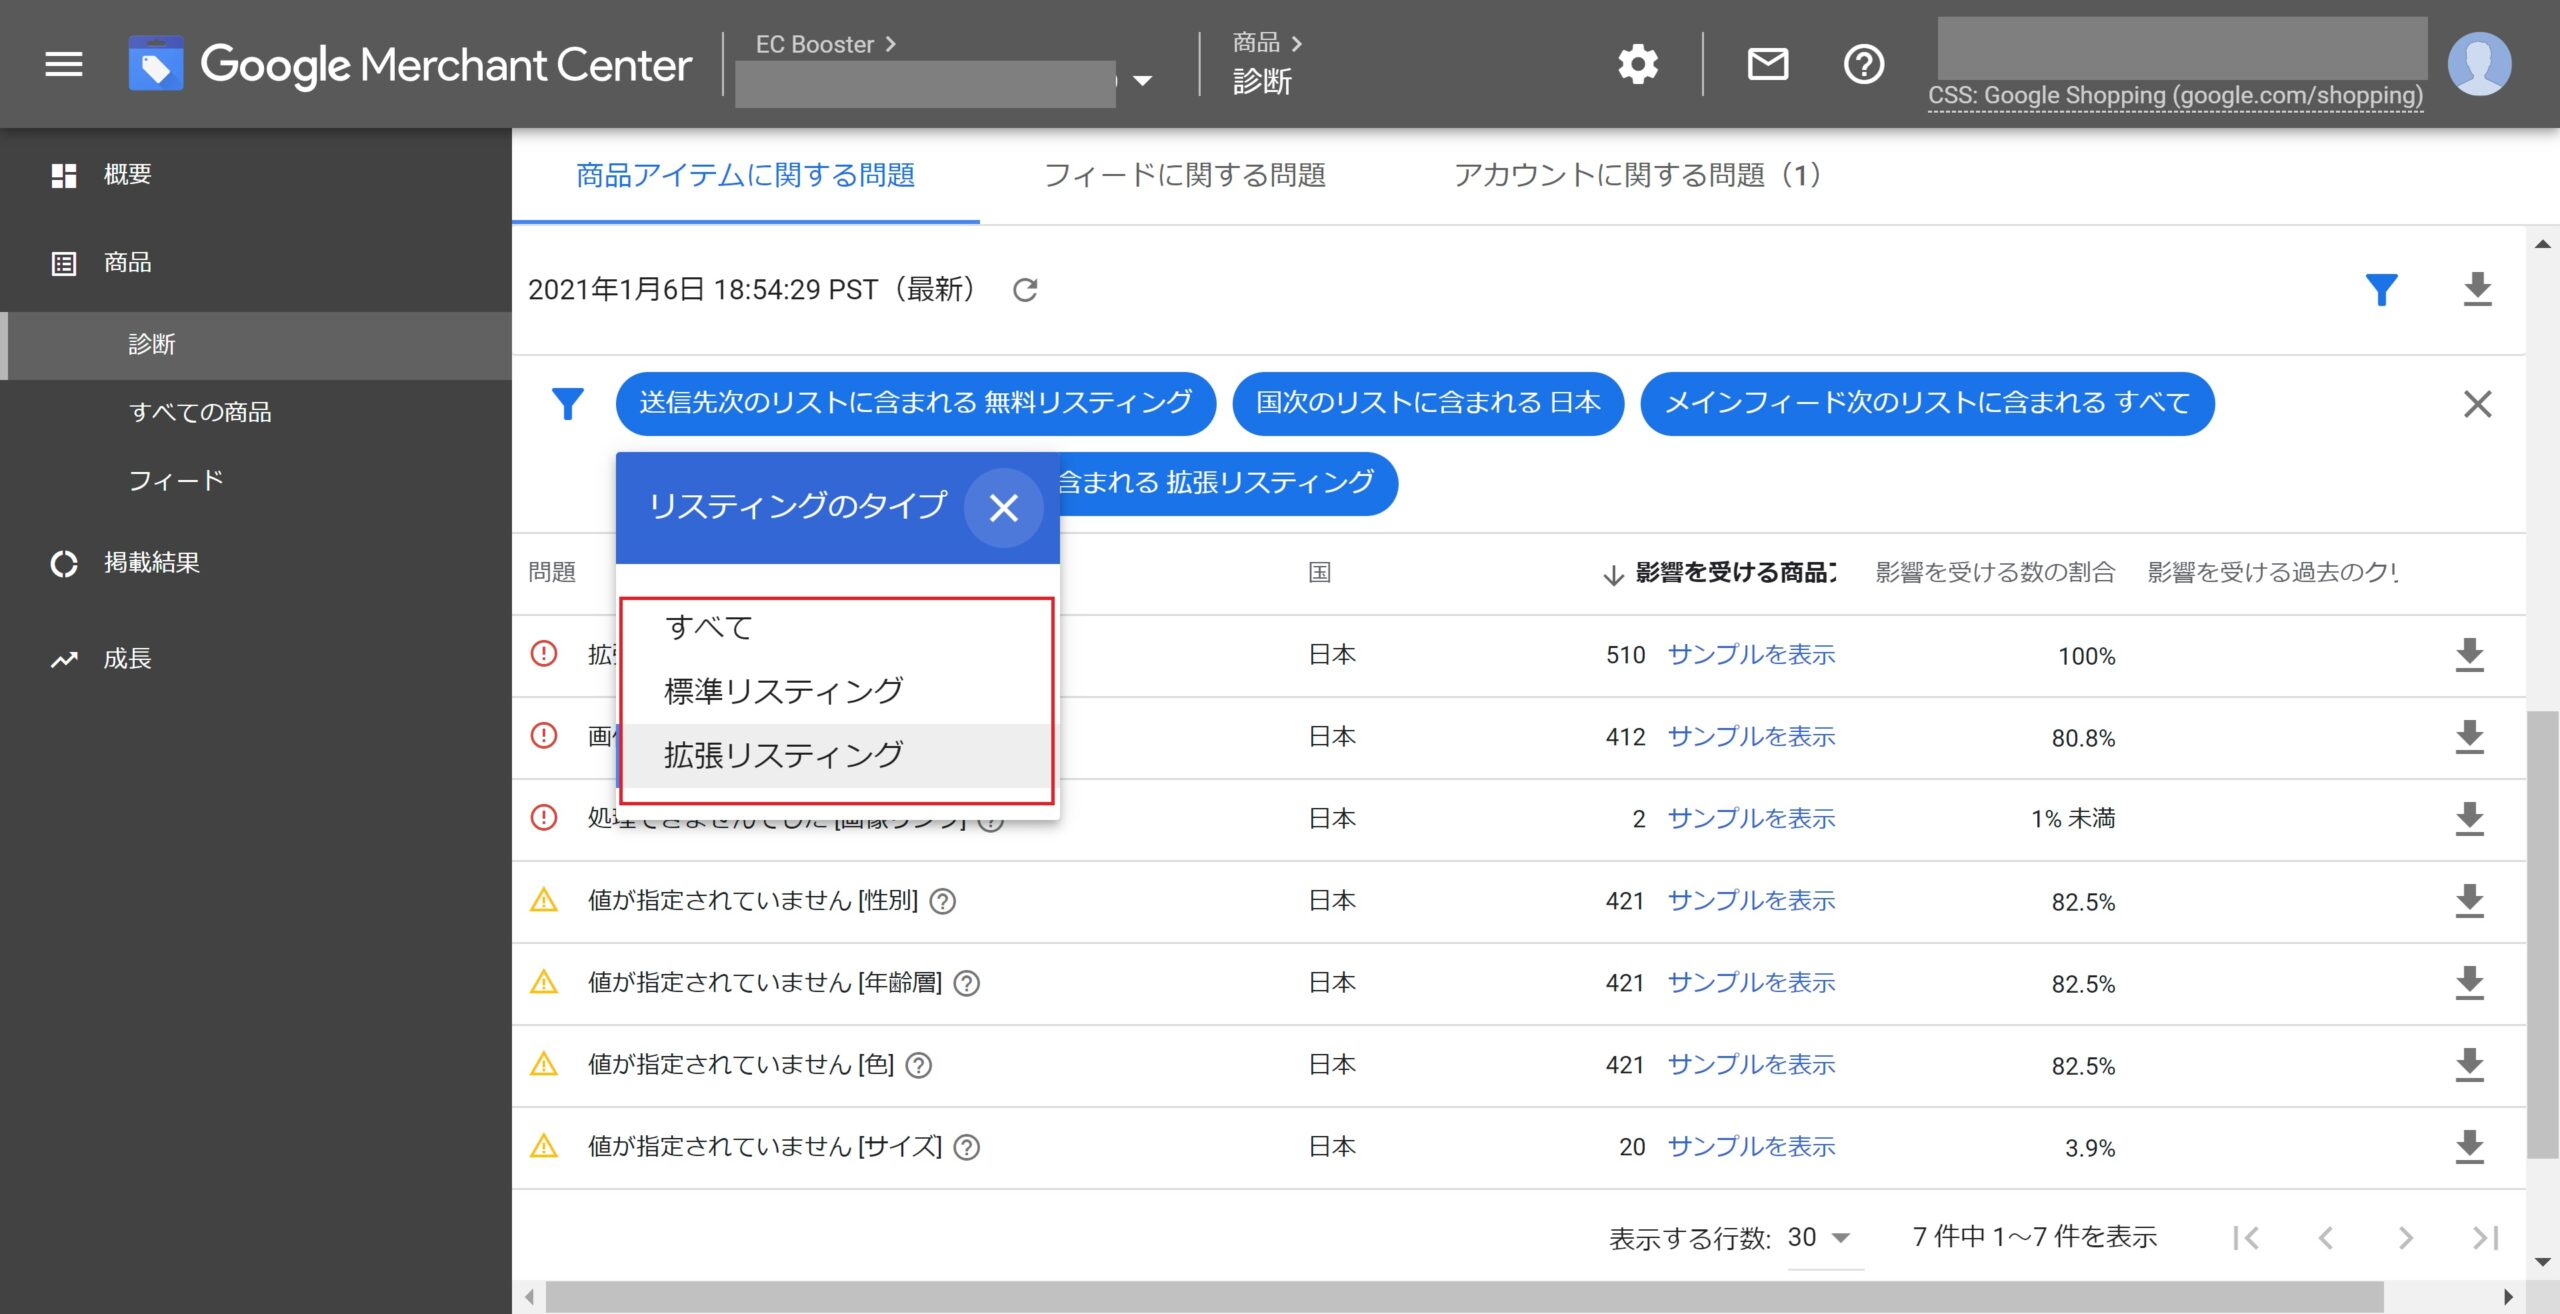 free-product-listings-google-merchant-center-dashboard-menu2